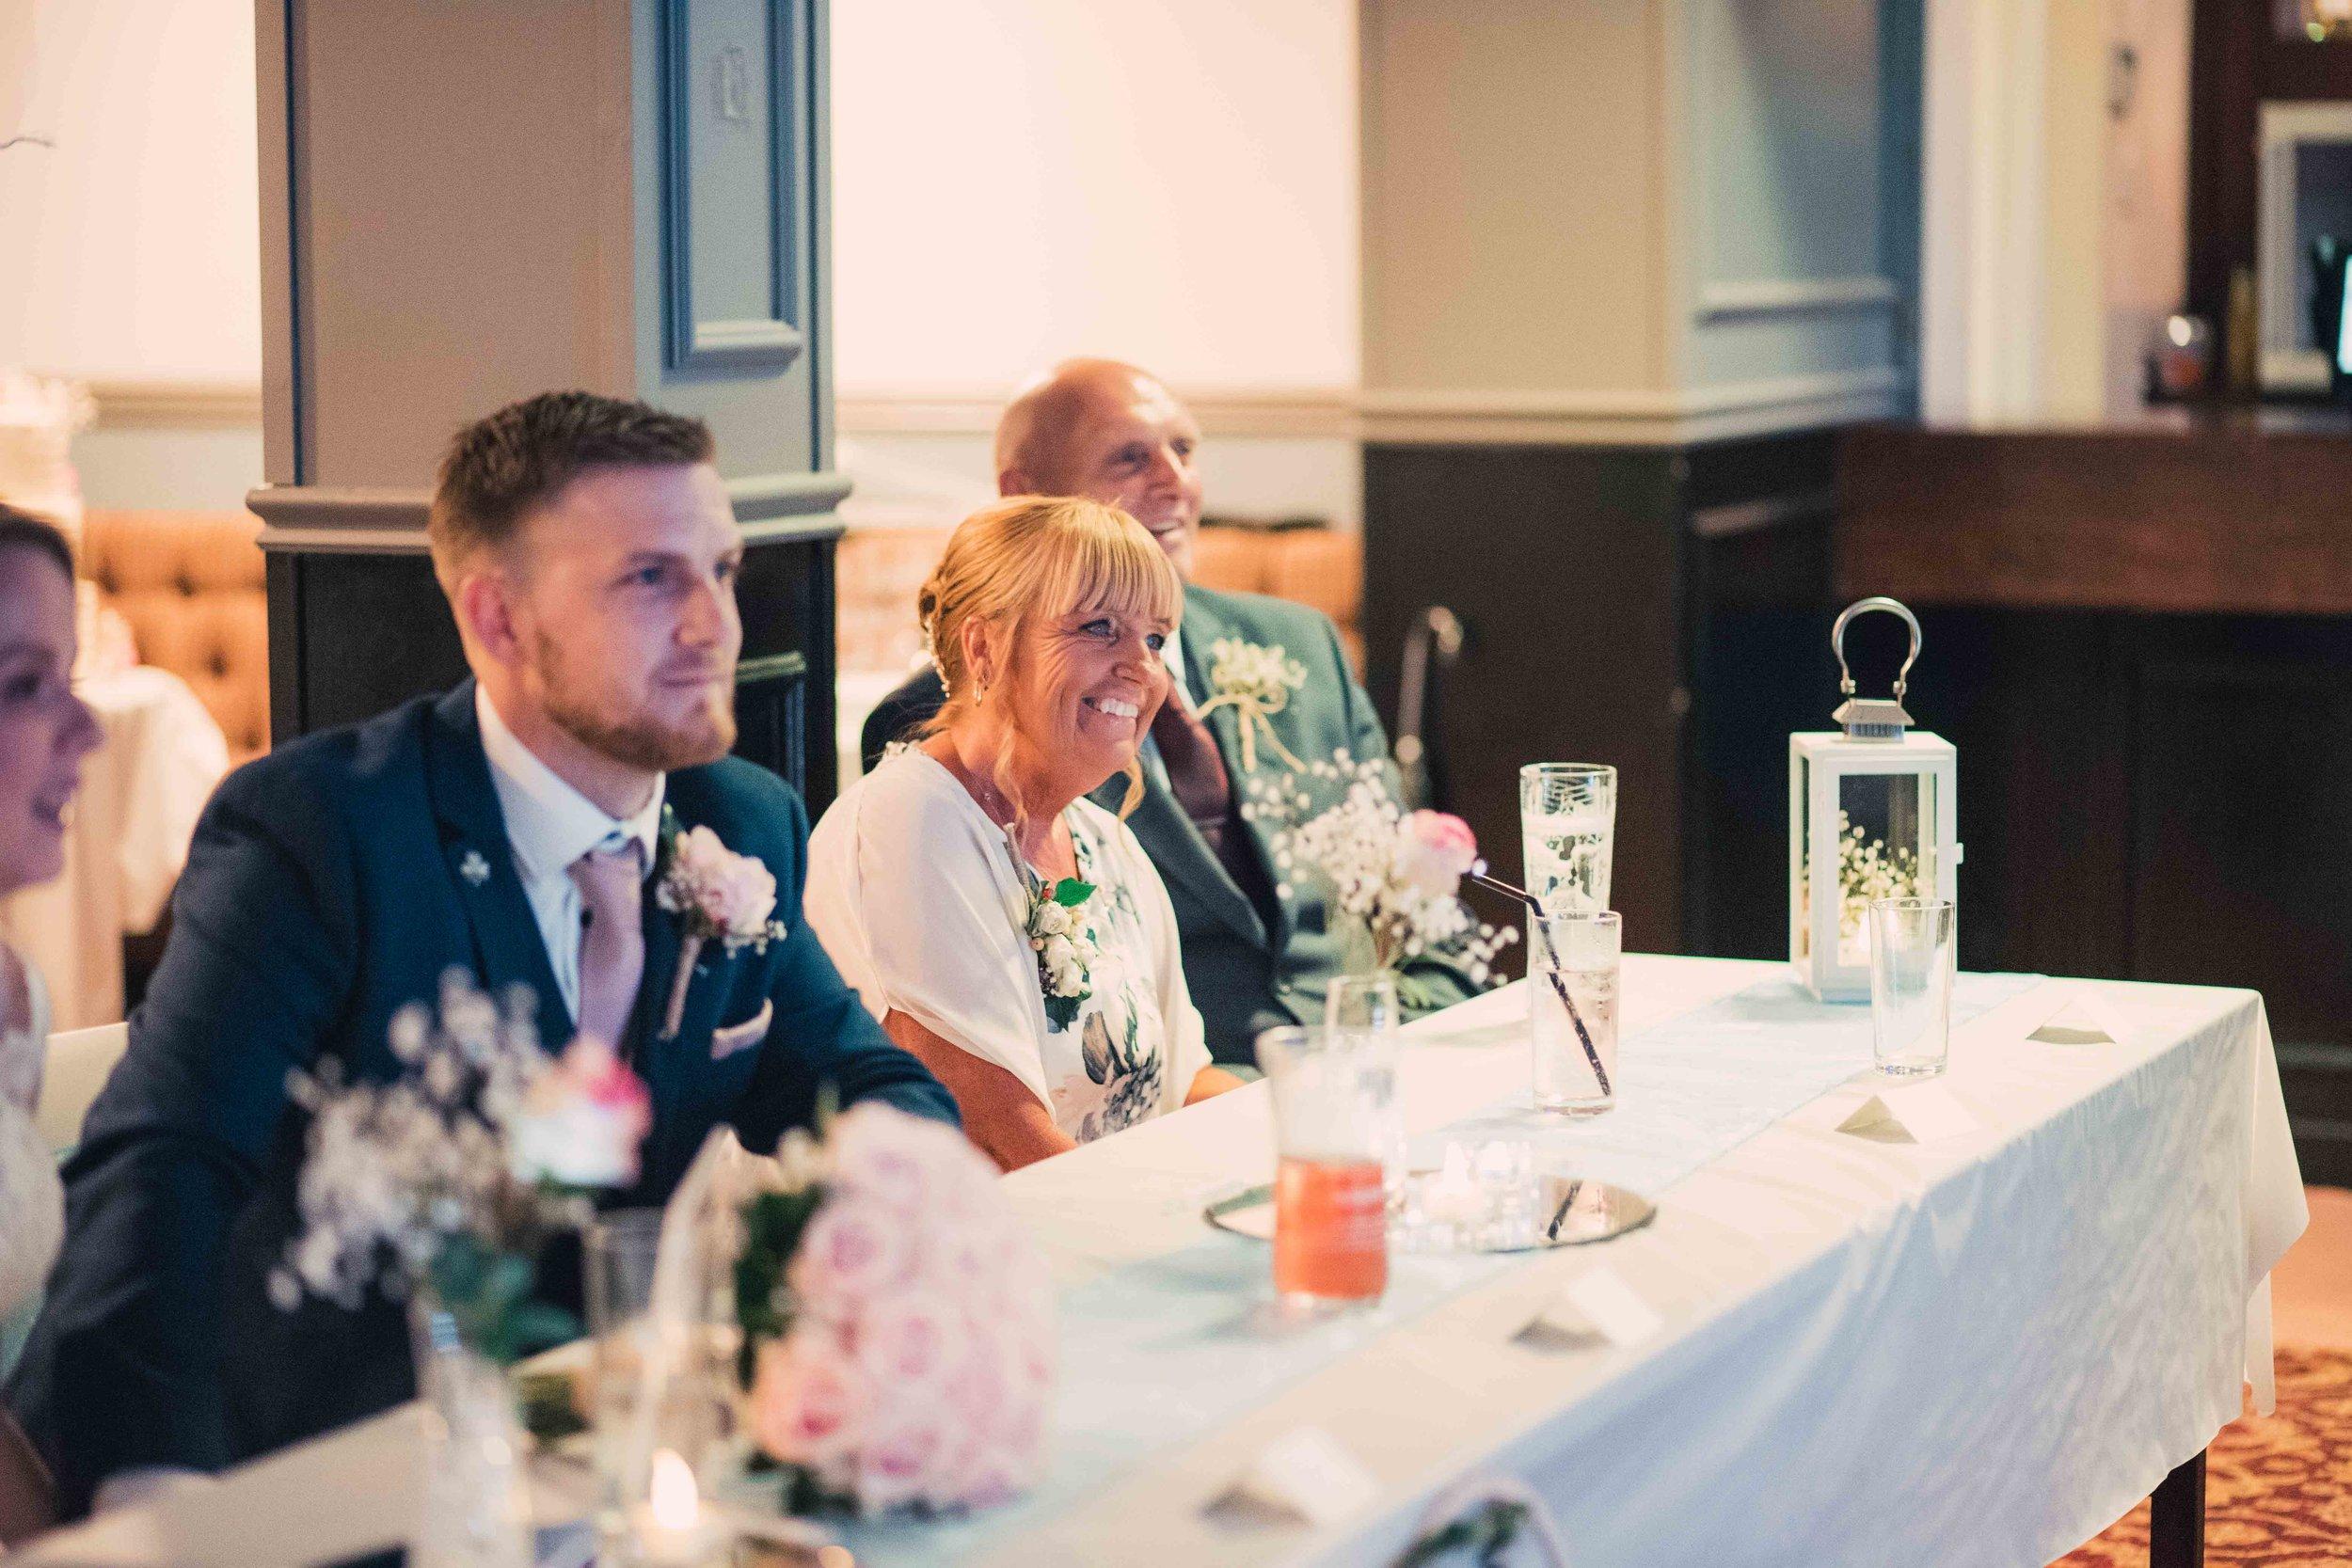 Lea-cooper-photography-willenhall-wolverhampton-wedding-photographer-birmingham-shirley-west-midlands-ceremony-church-26.JPG